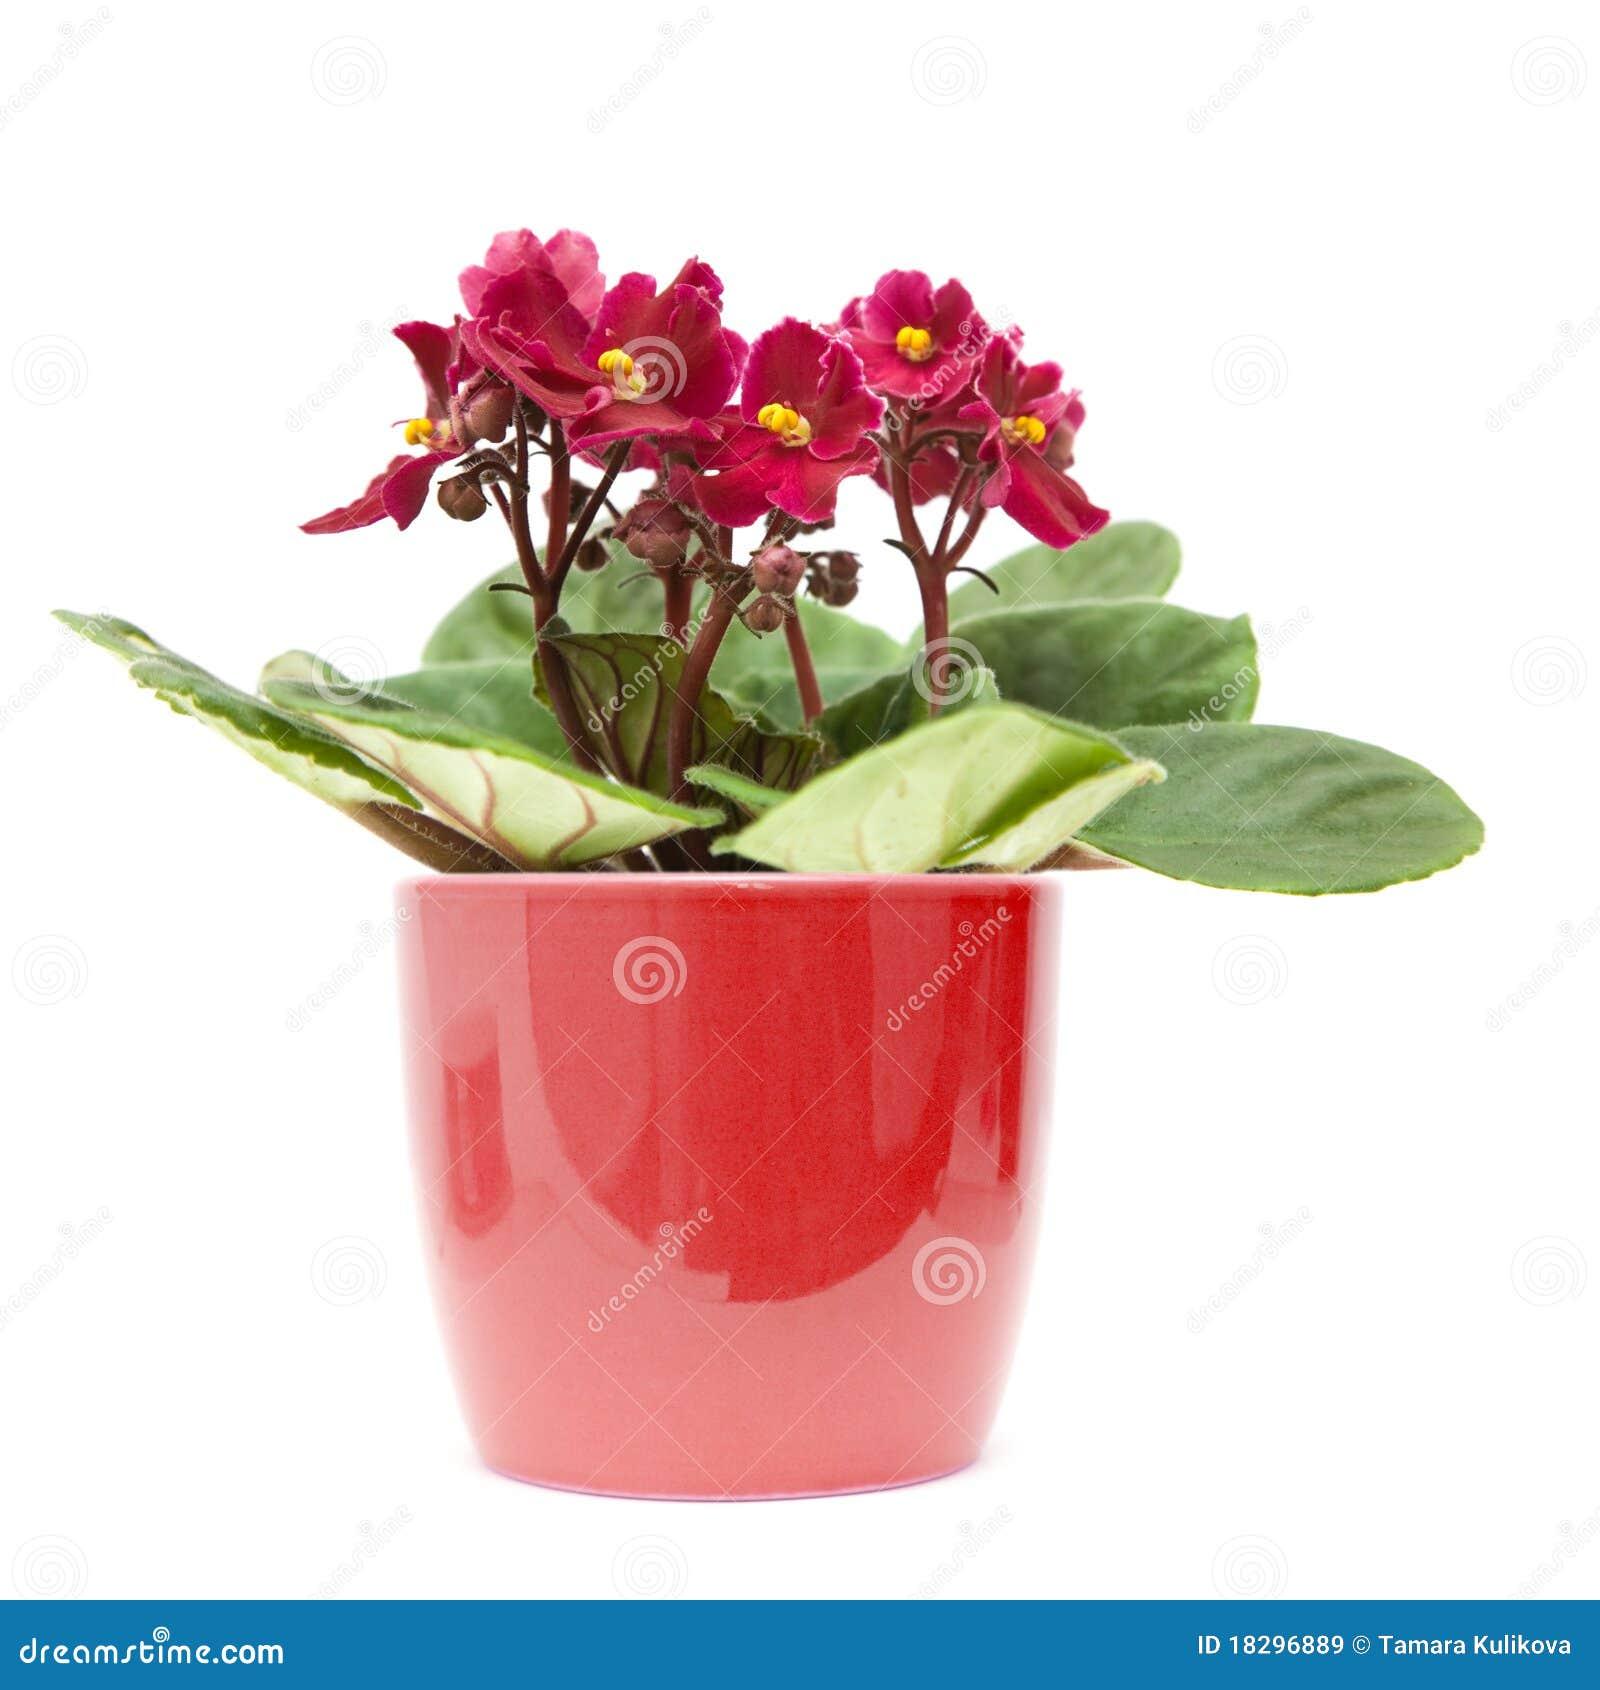 Violette africaine images libres de droits image 18296889 for Violette africane